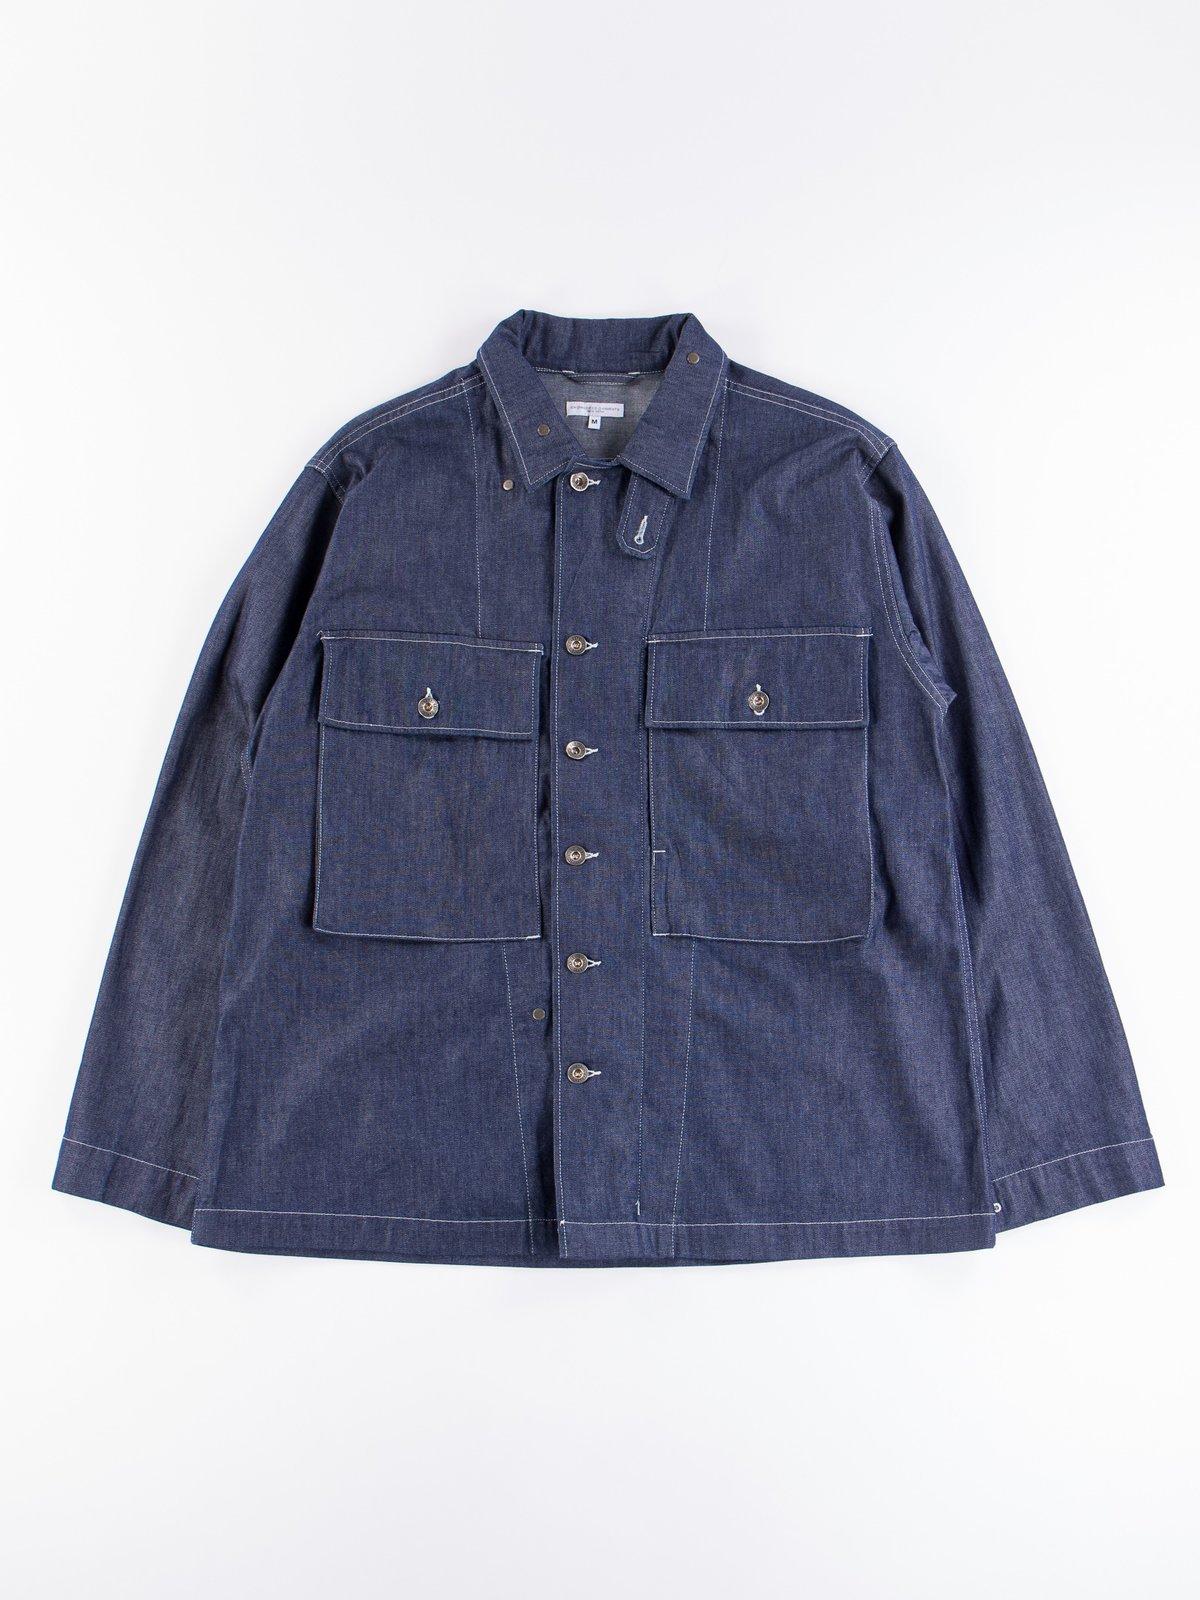 Indigo 8oz Cone Denim M43/2 Shirt Jacket - Image 1